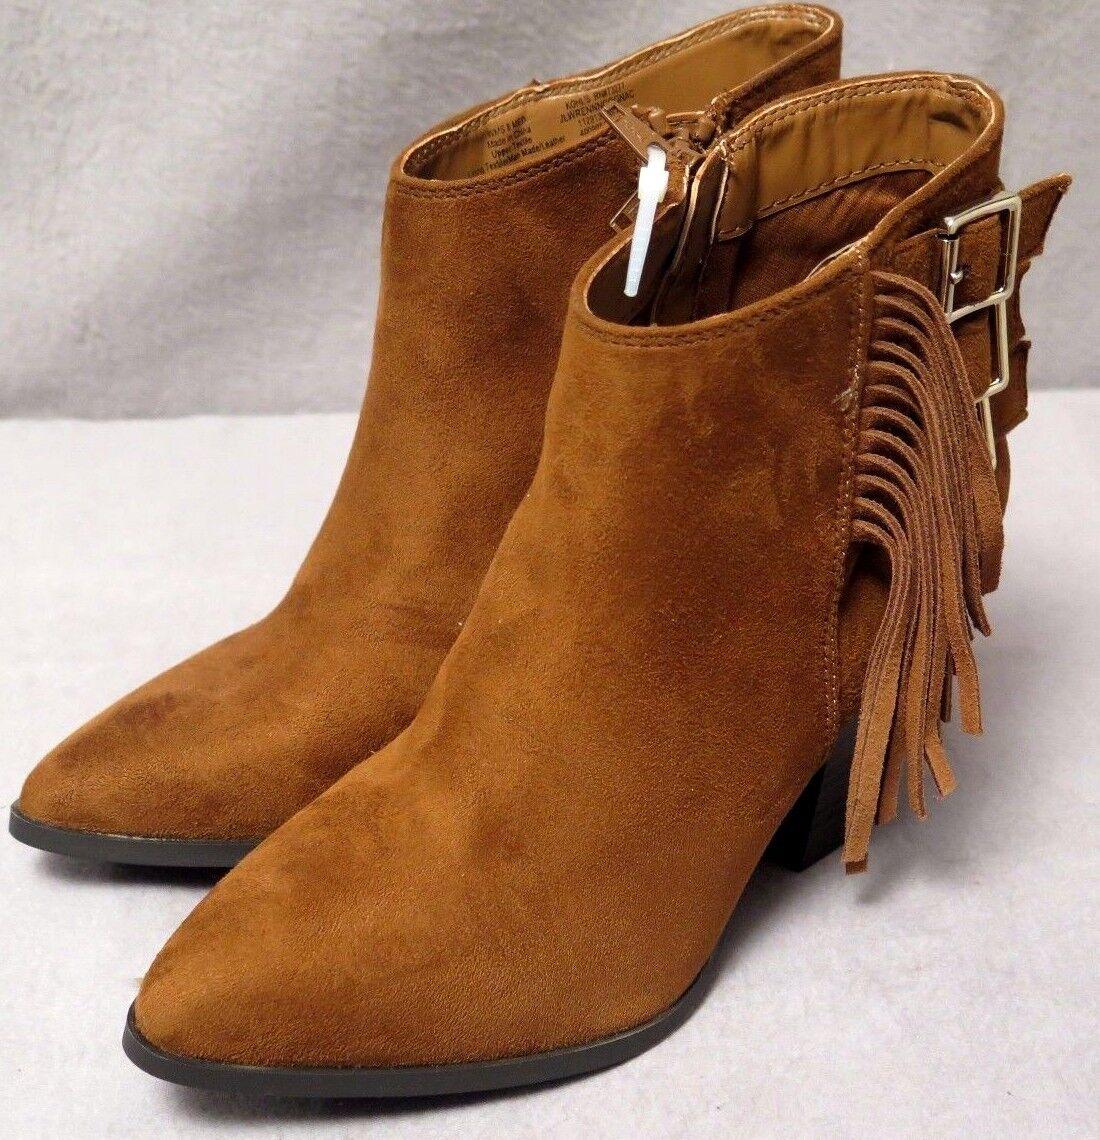 JENNIFER LOPEZ COGNAC Womens Brown Fashion/Casual High Heels Dress Boots BNWOB